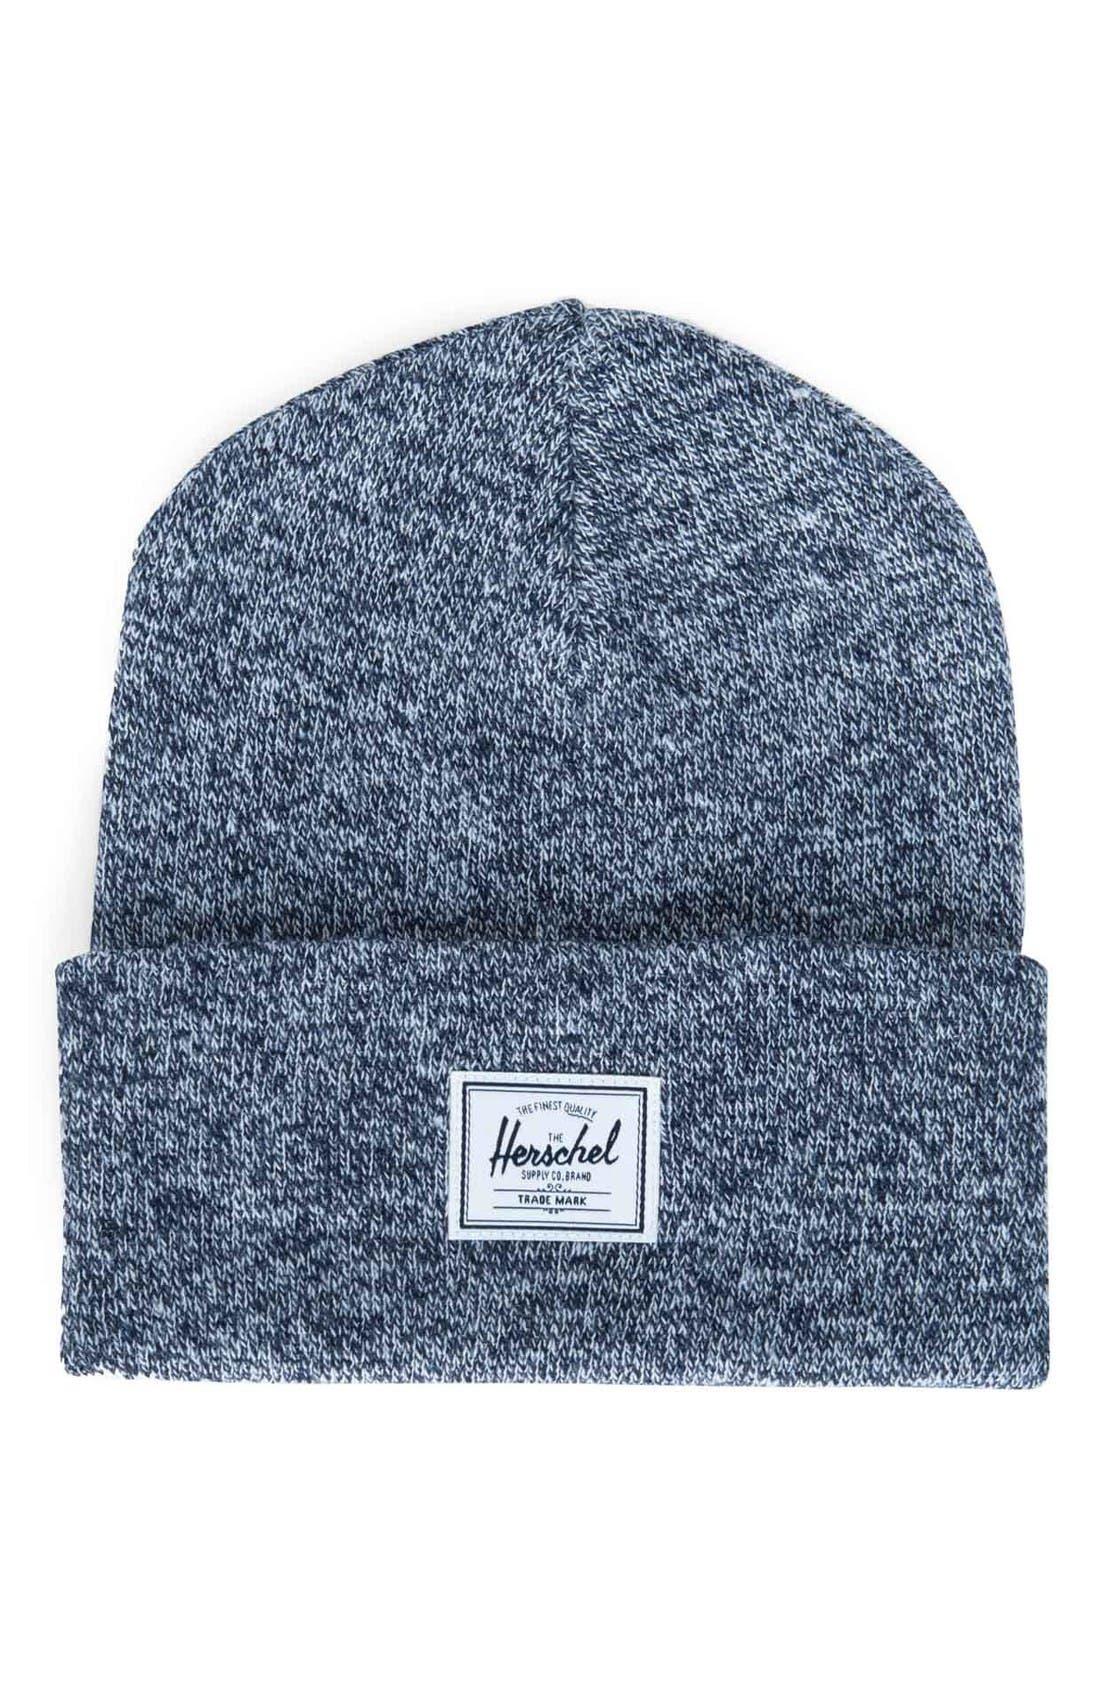 Alternate Image 1 Selected - Herschel Supply Co. Elmer Knit Beanie